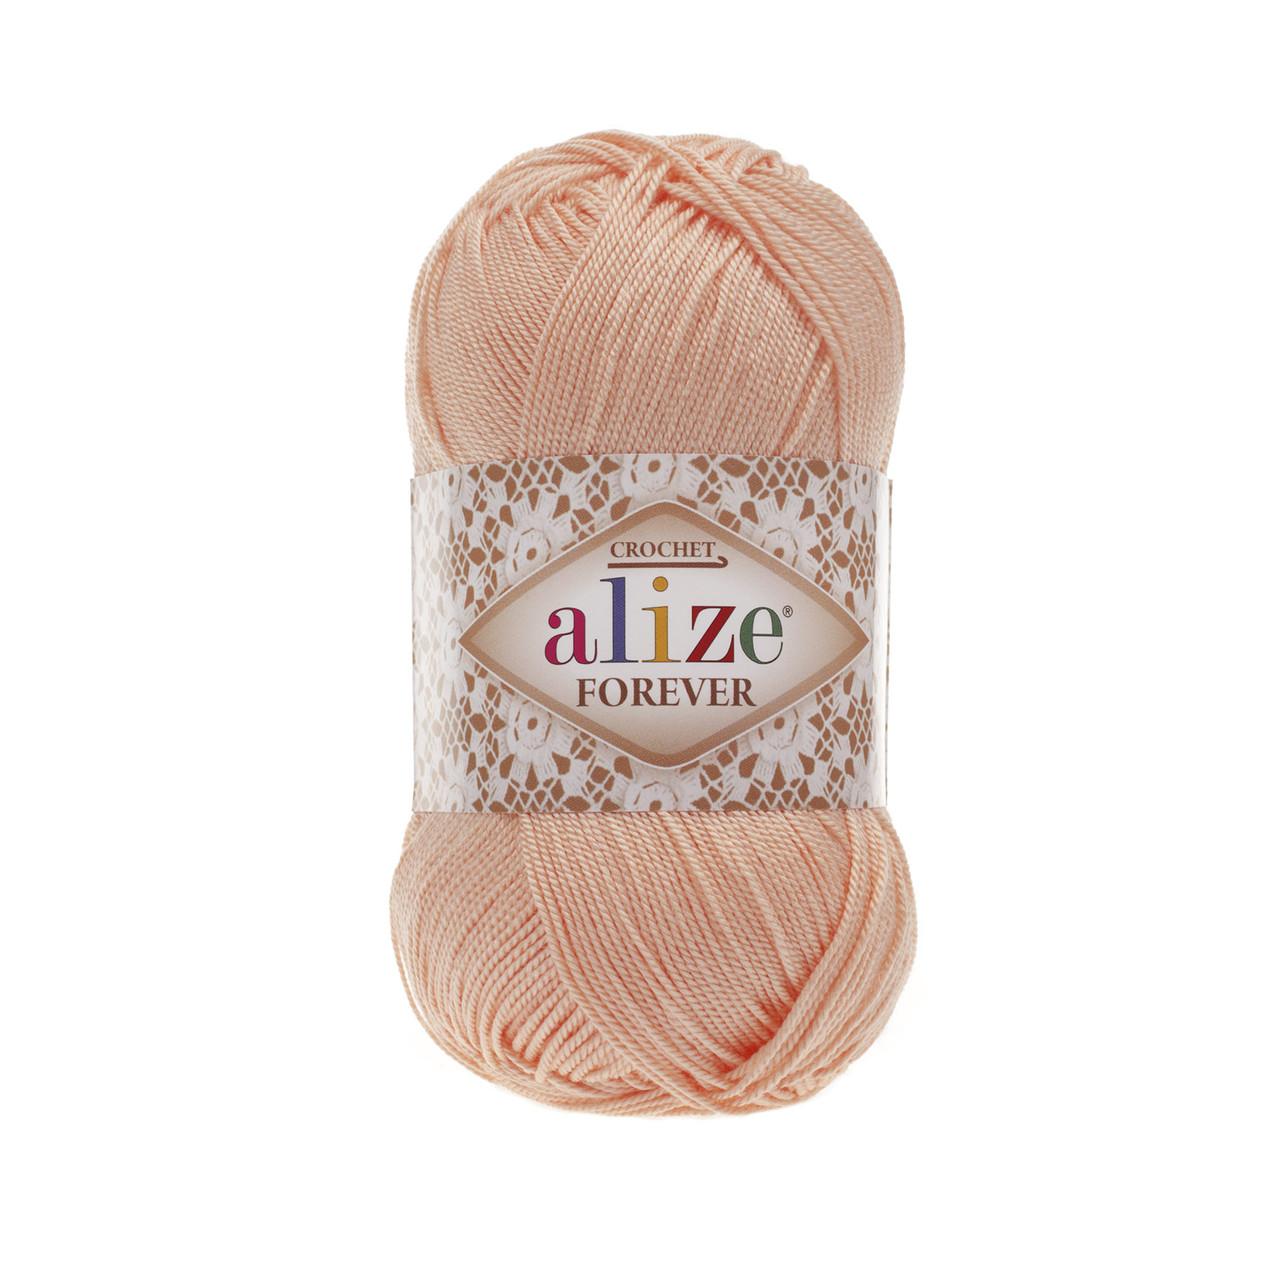 Пряжа Ализе Форевер Alize Forever, цвет №282 персиковый